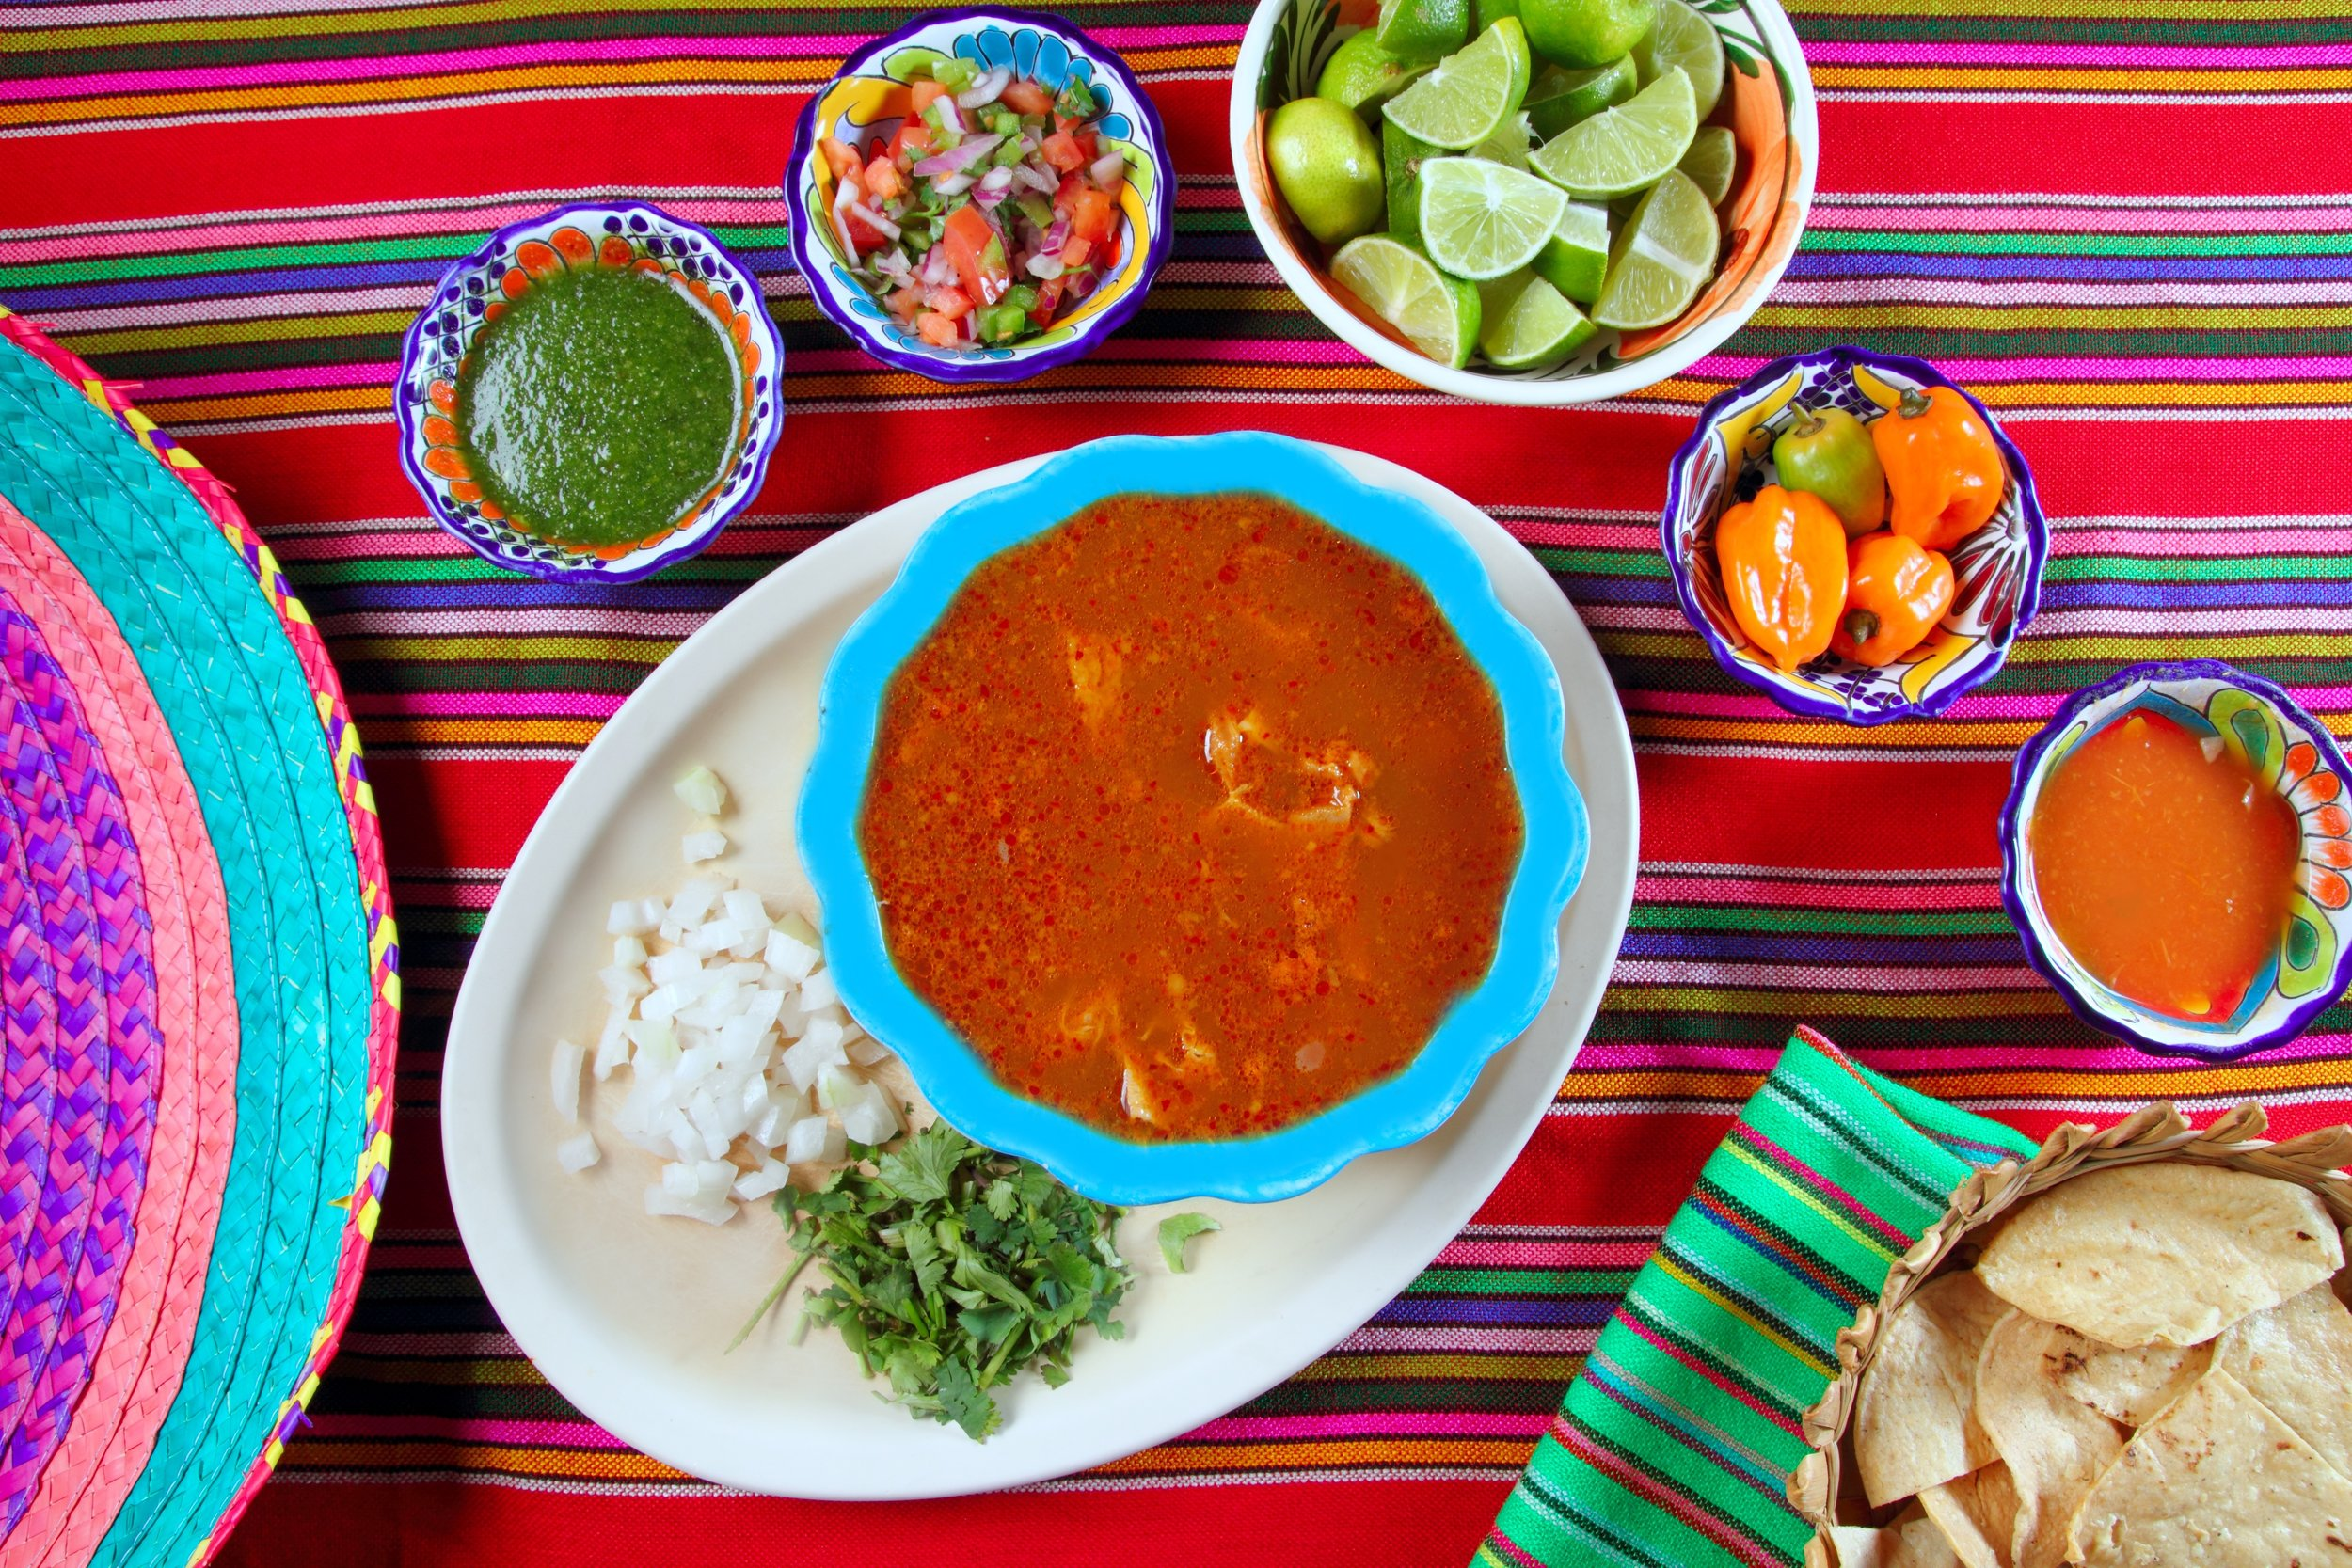 Comida mexicana NO engorda.jpg